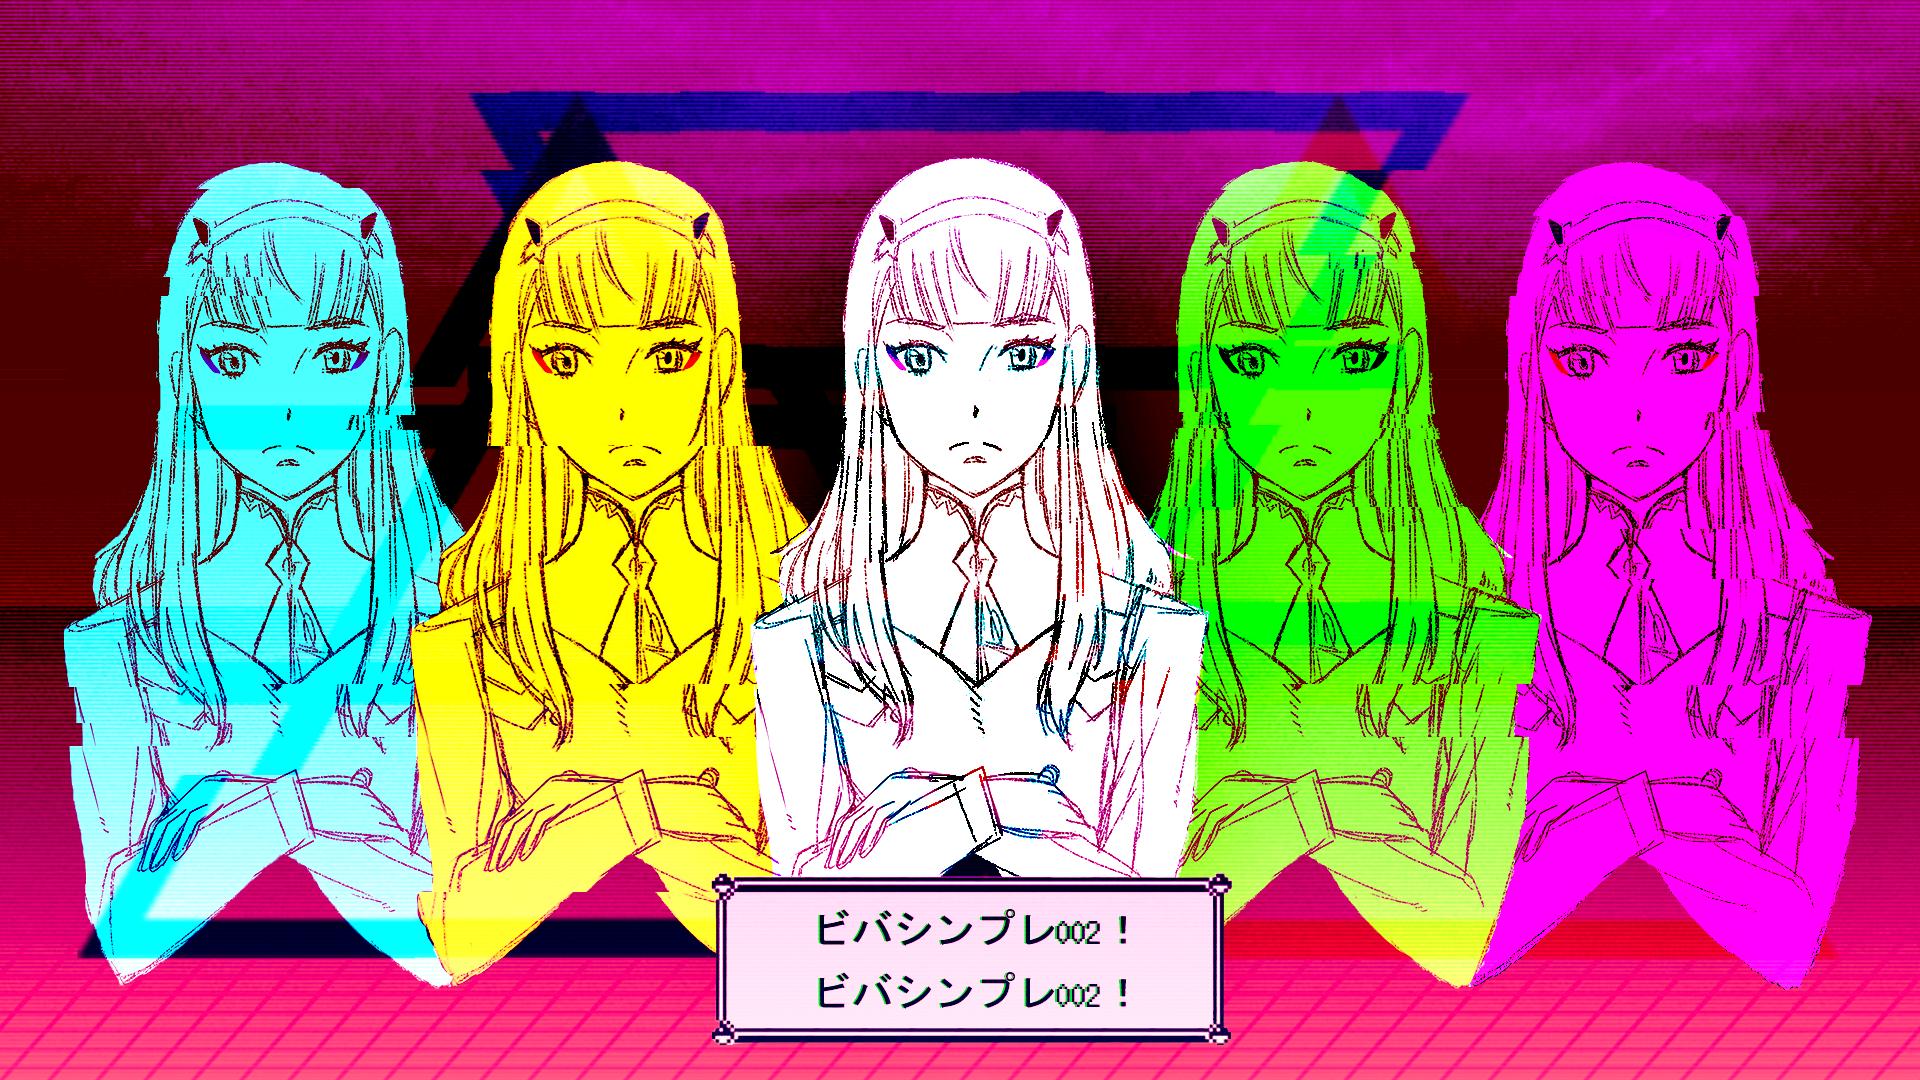 Wallpaper Darling In The Franxx Zero Two Darling In The Franxx Vaporwave Chromatic Aberration Grid Anime Girls Love 1920x1080 Linkswar 1249311 Hd Wallpapers Wallhere